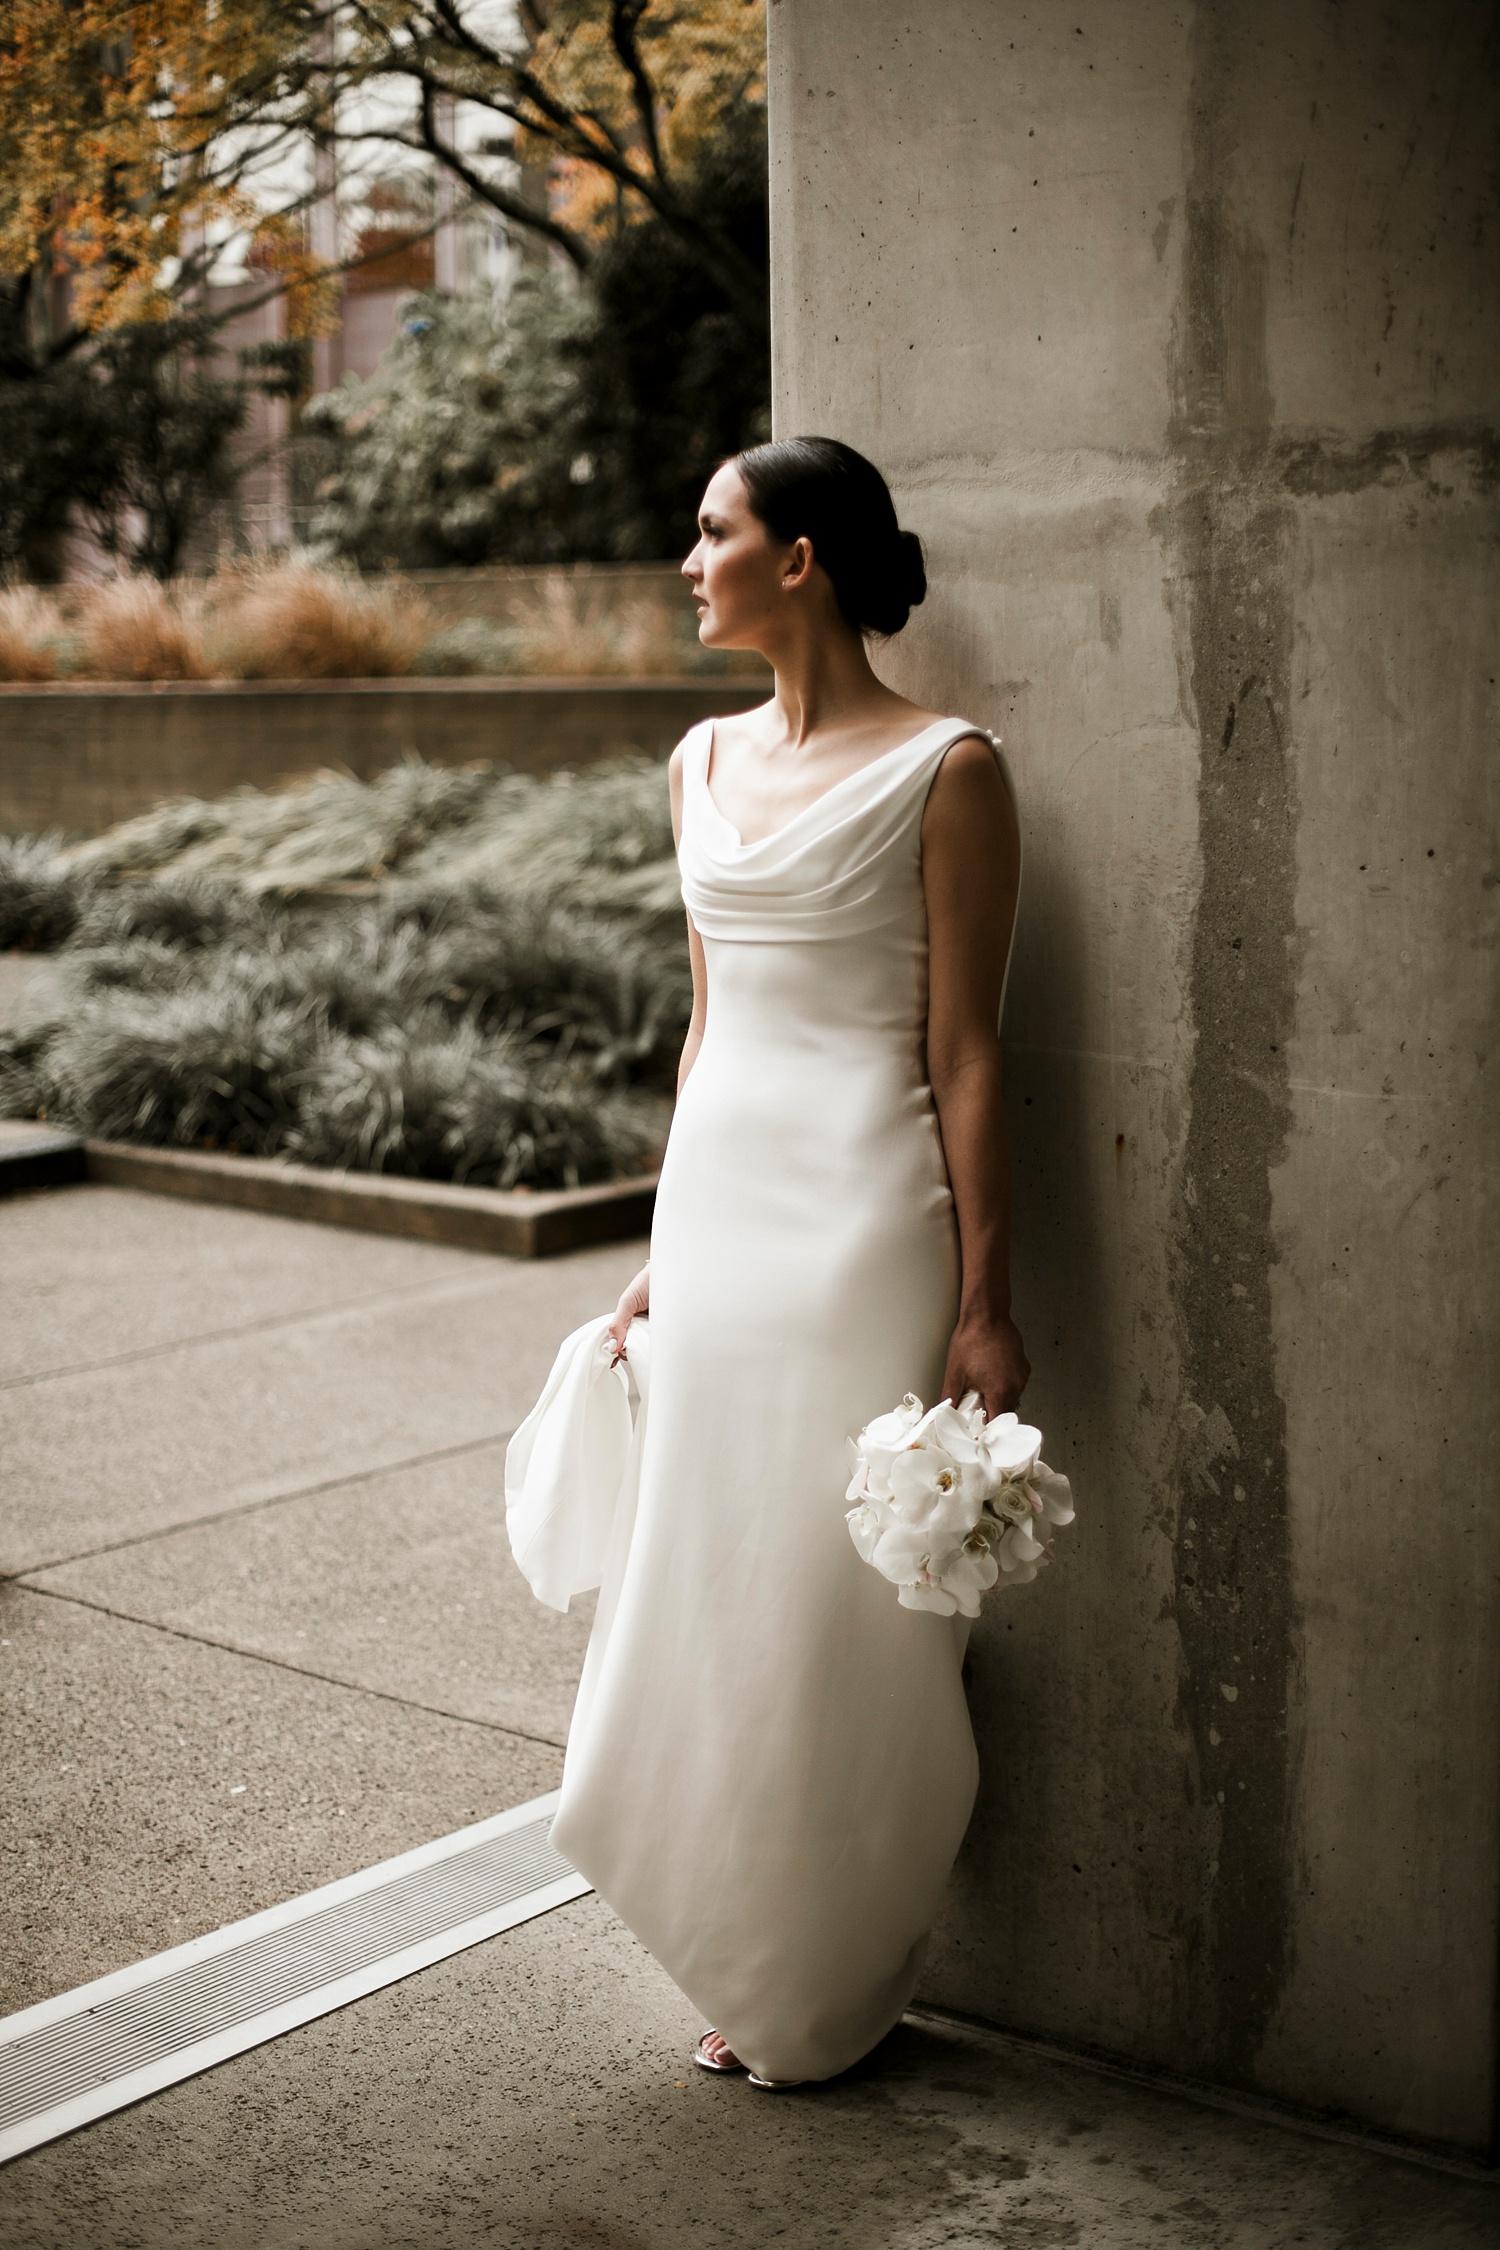 los angeles wedding photographer_035.JPG